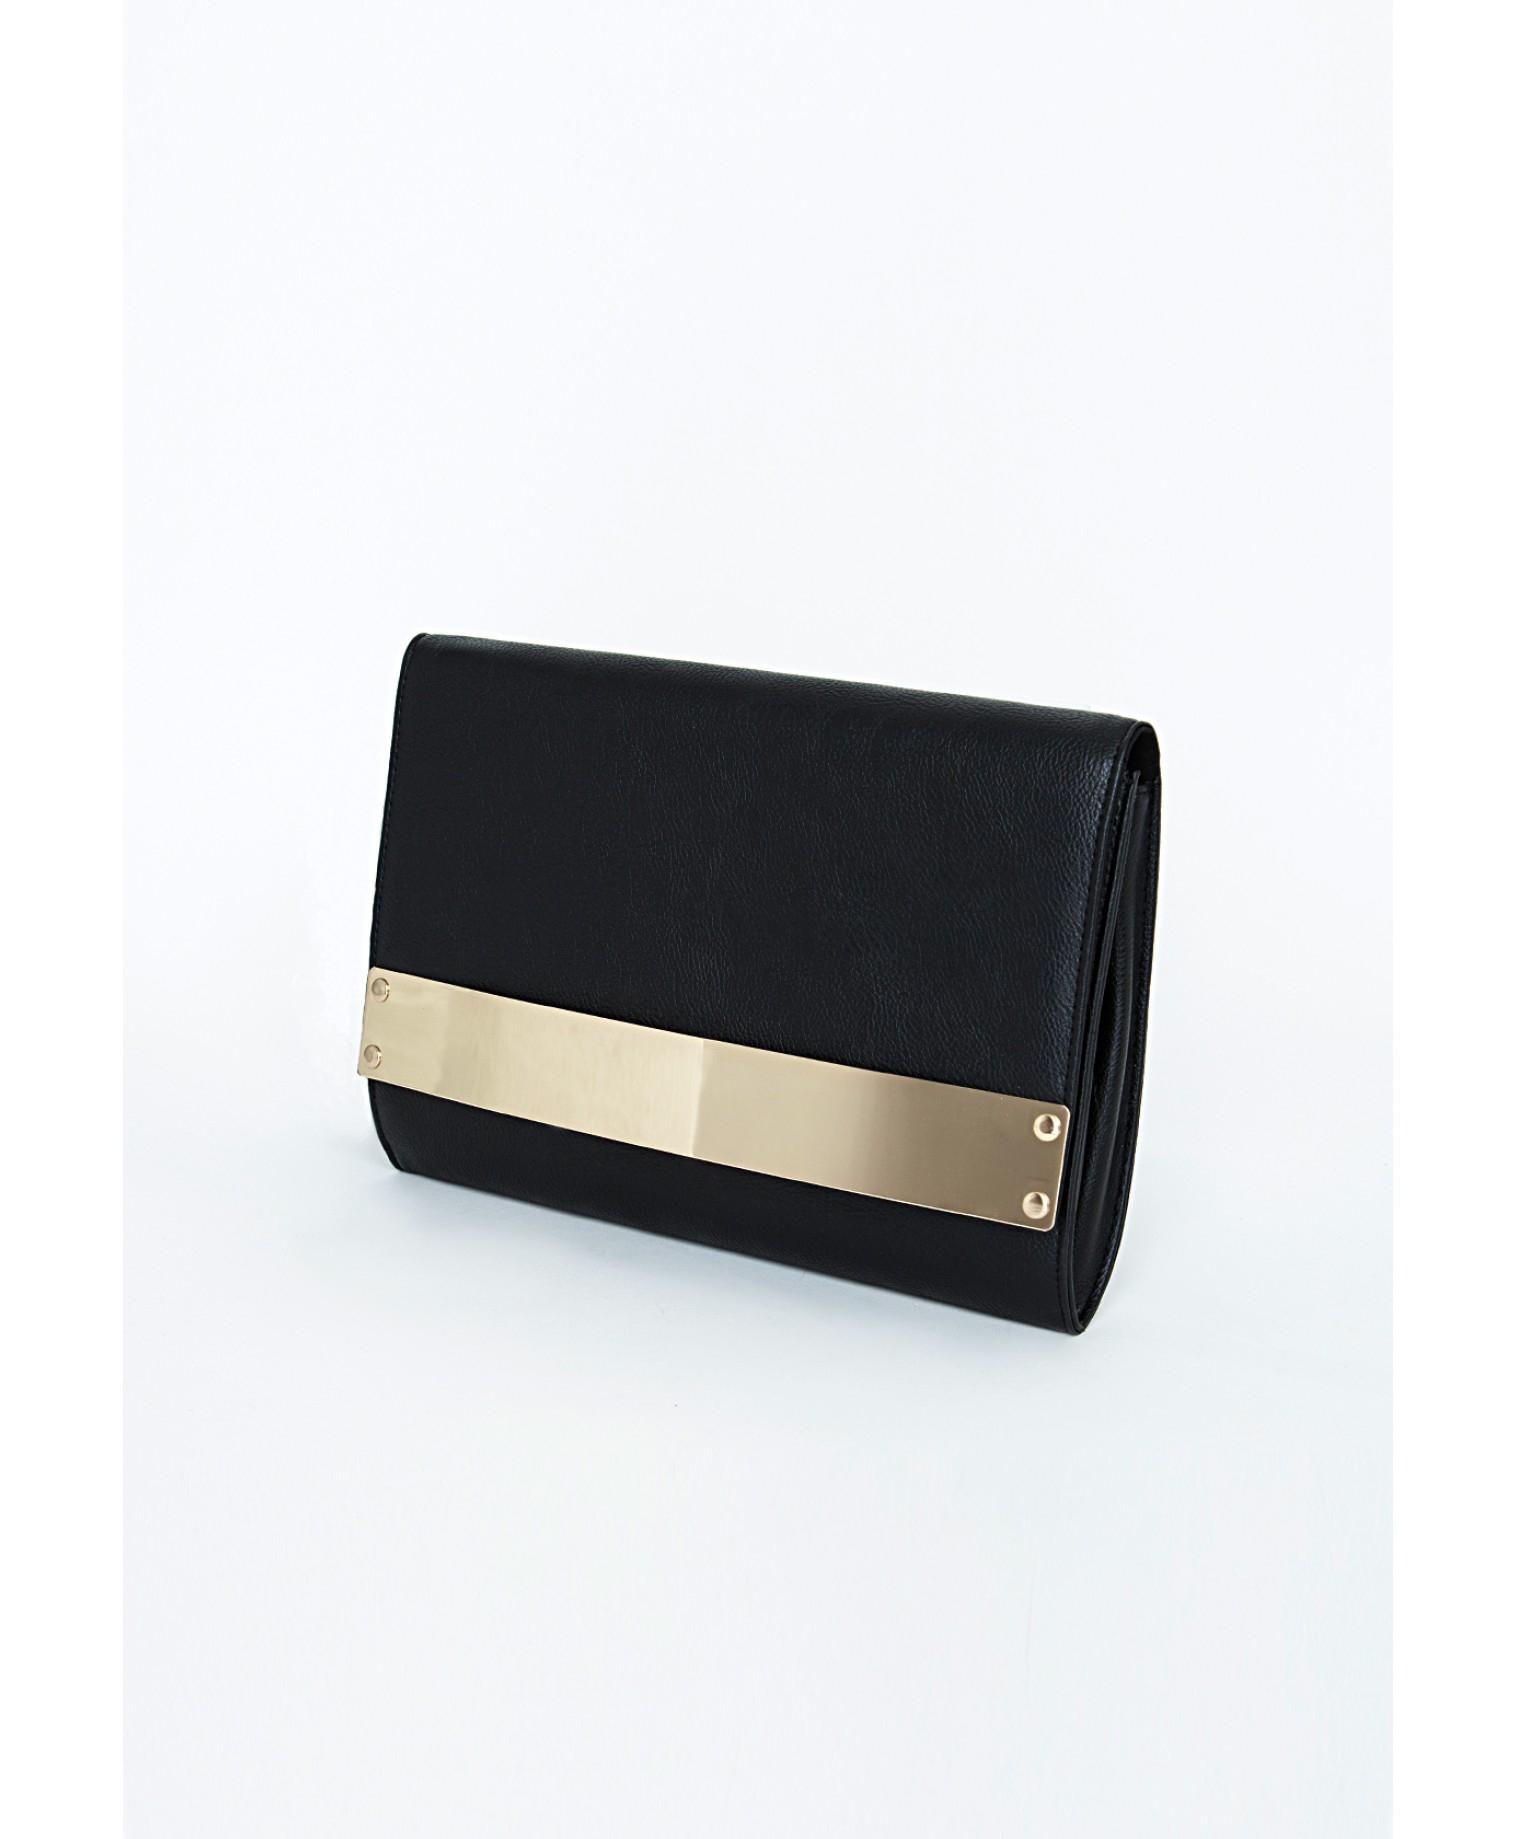 Gallery Women S Black Box Clutch Bags